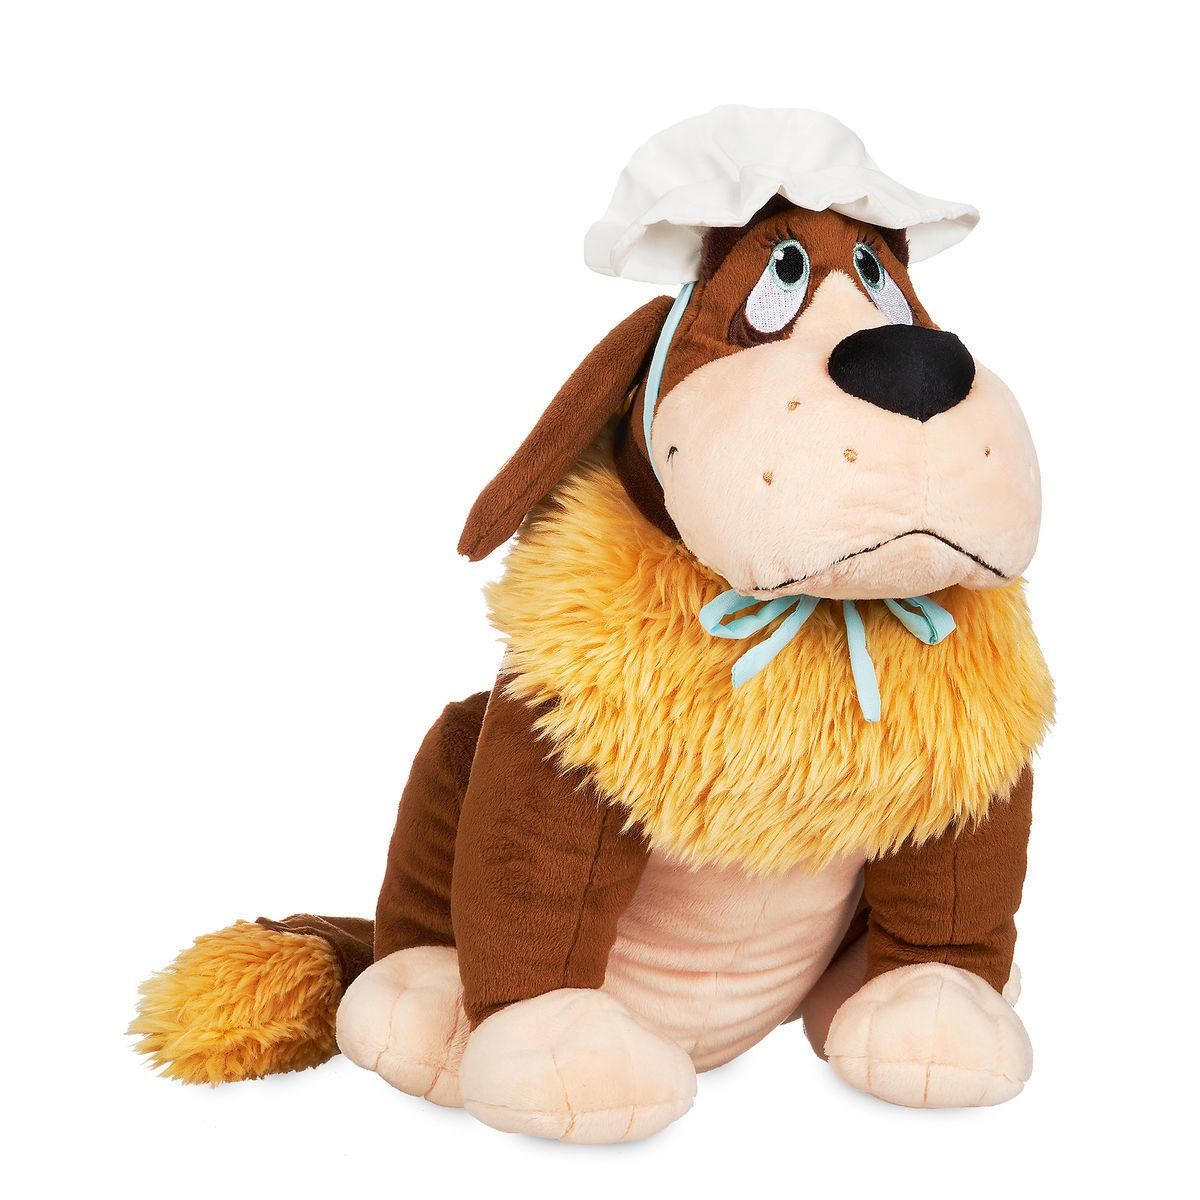 Disney Мягкая игрушка собака сенбернар Нана 34см - Питер Пен